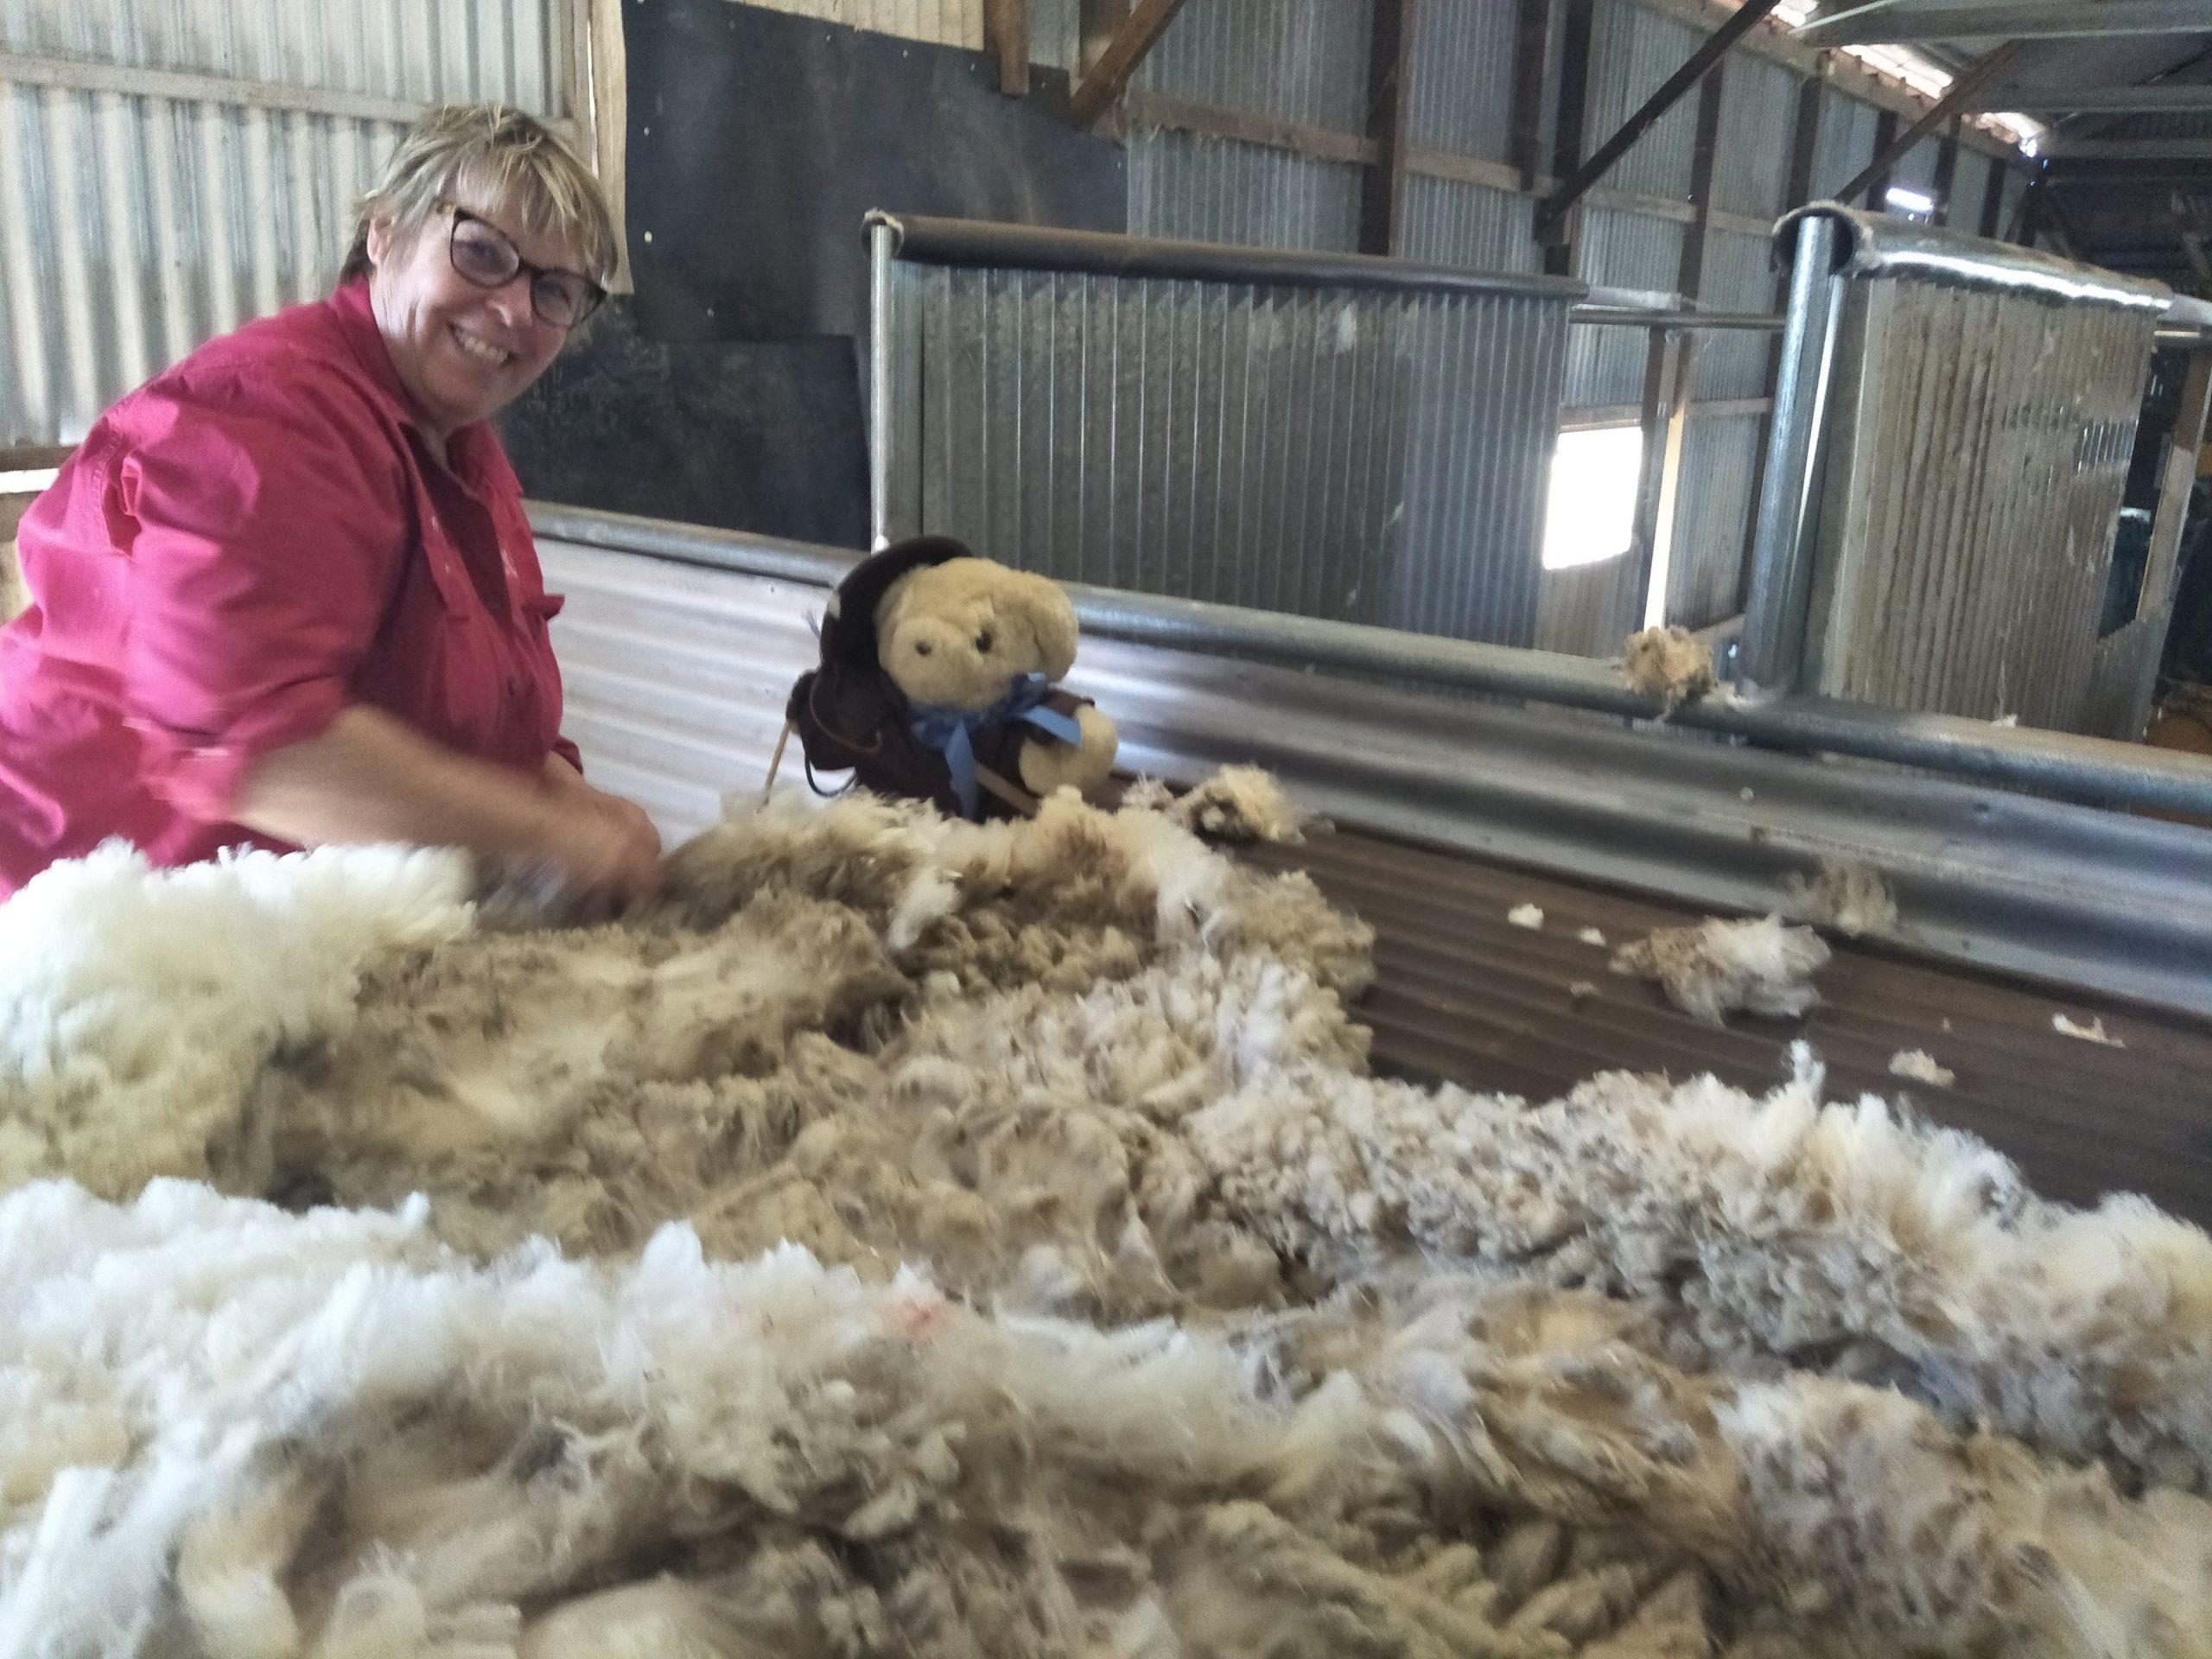 Wool Classing